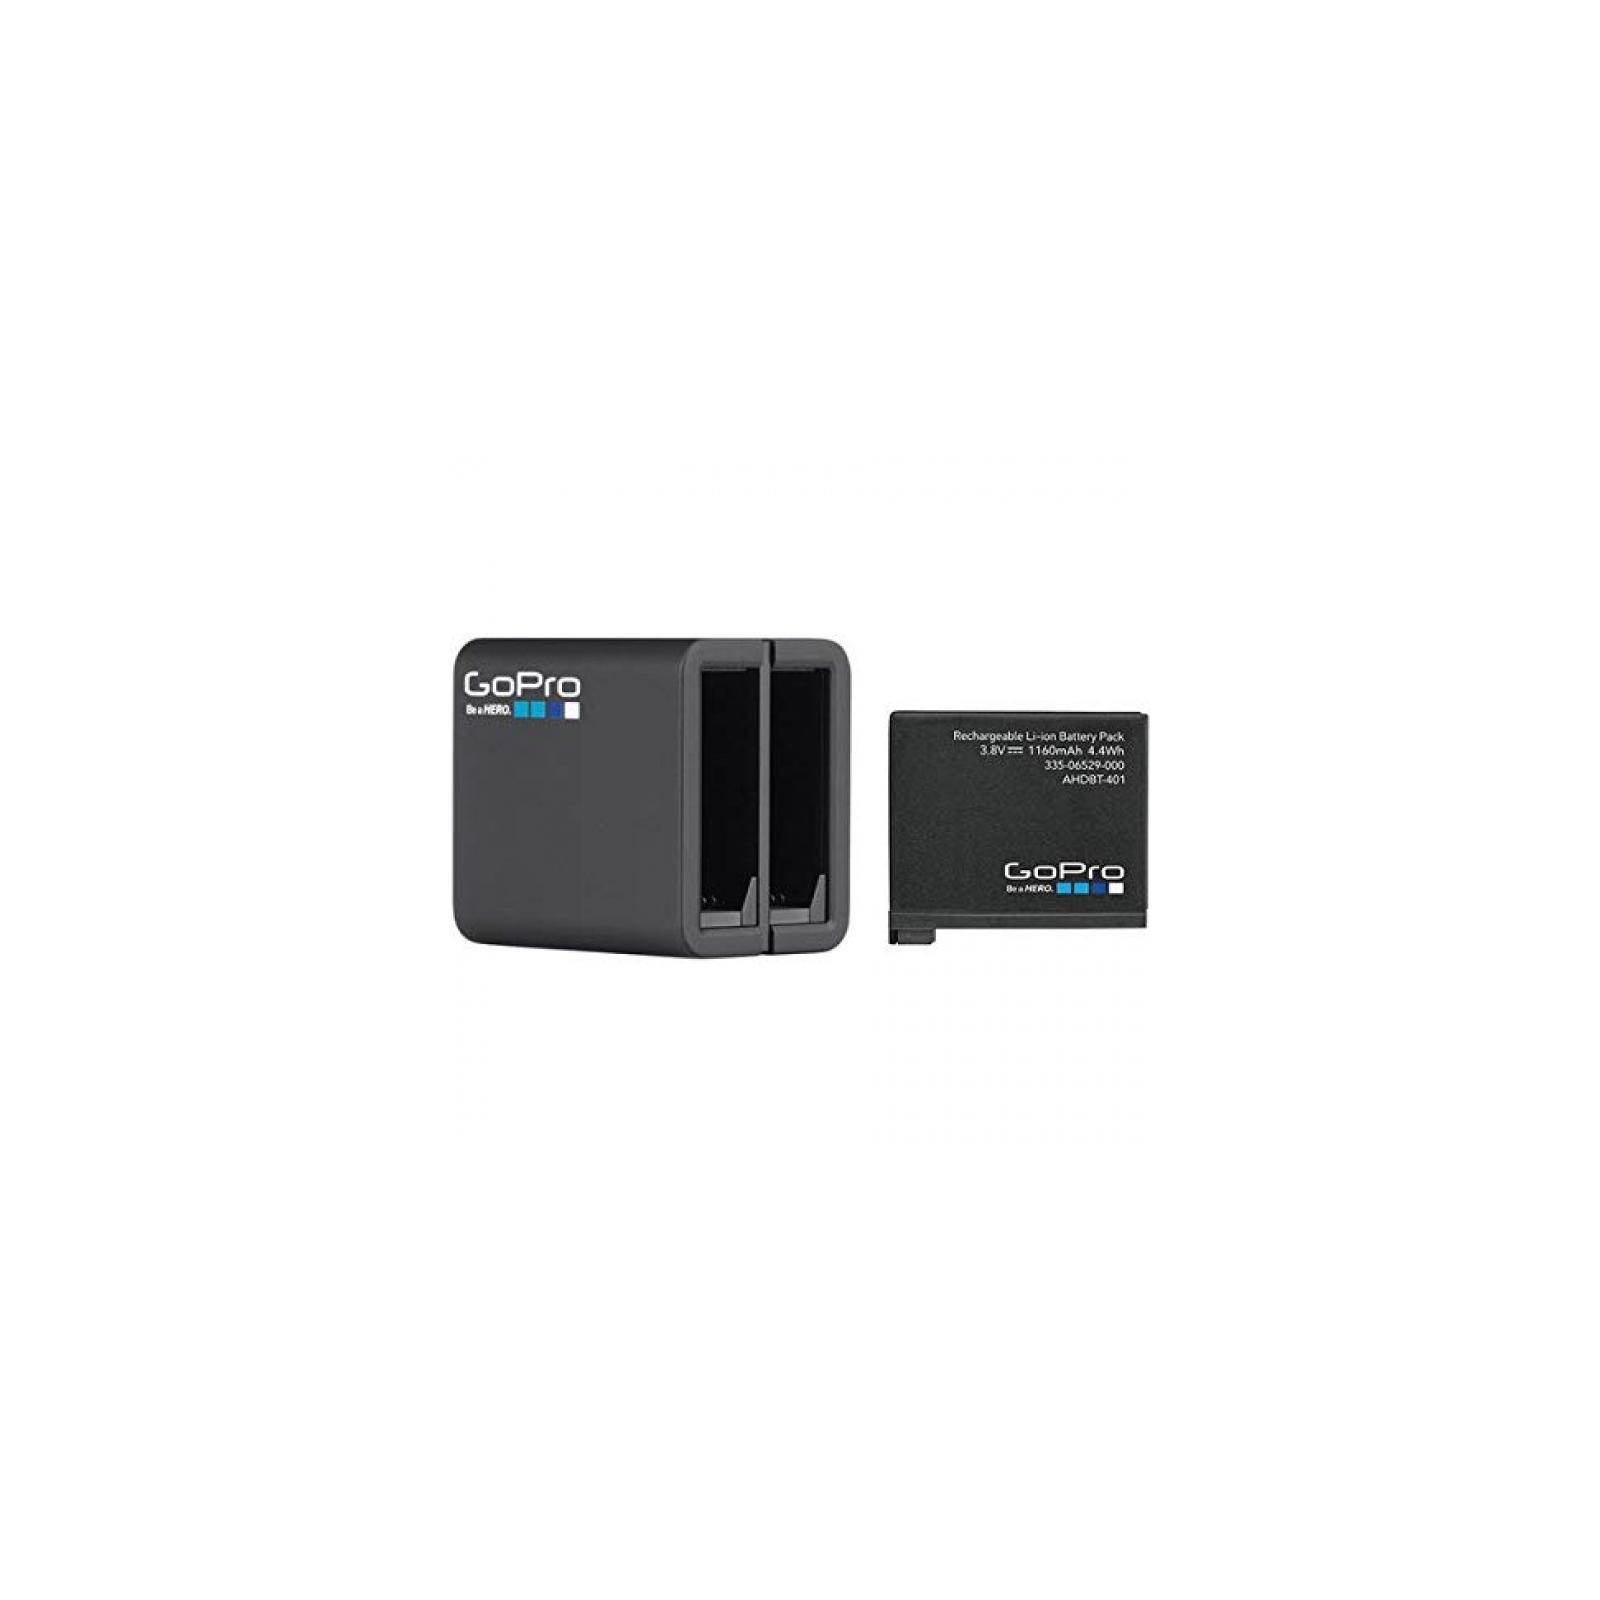 Аксессуар к экшн-камерам GoPro Dual Battery Charger HERO 4 (AHBBP-401)